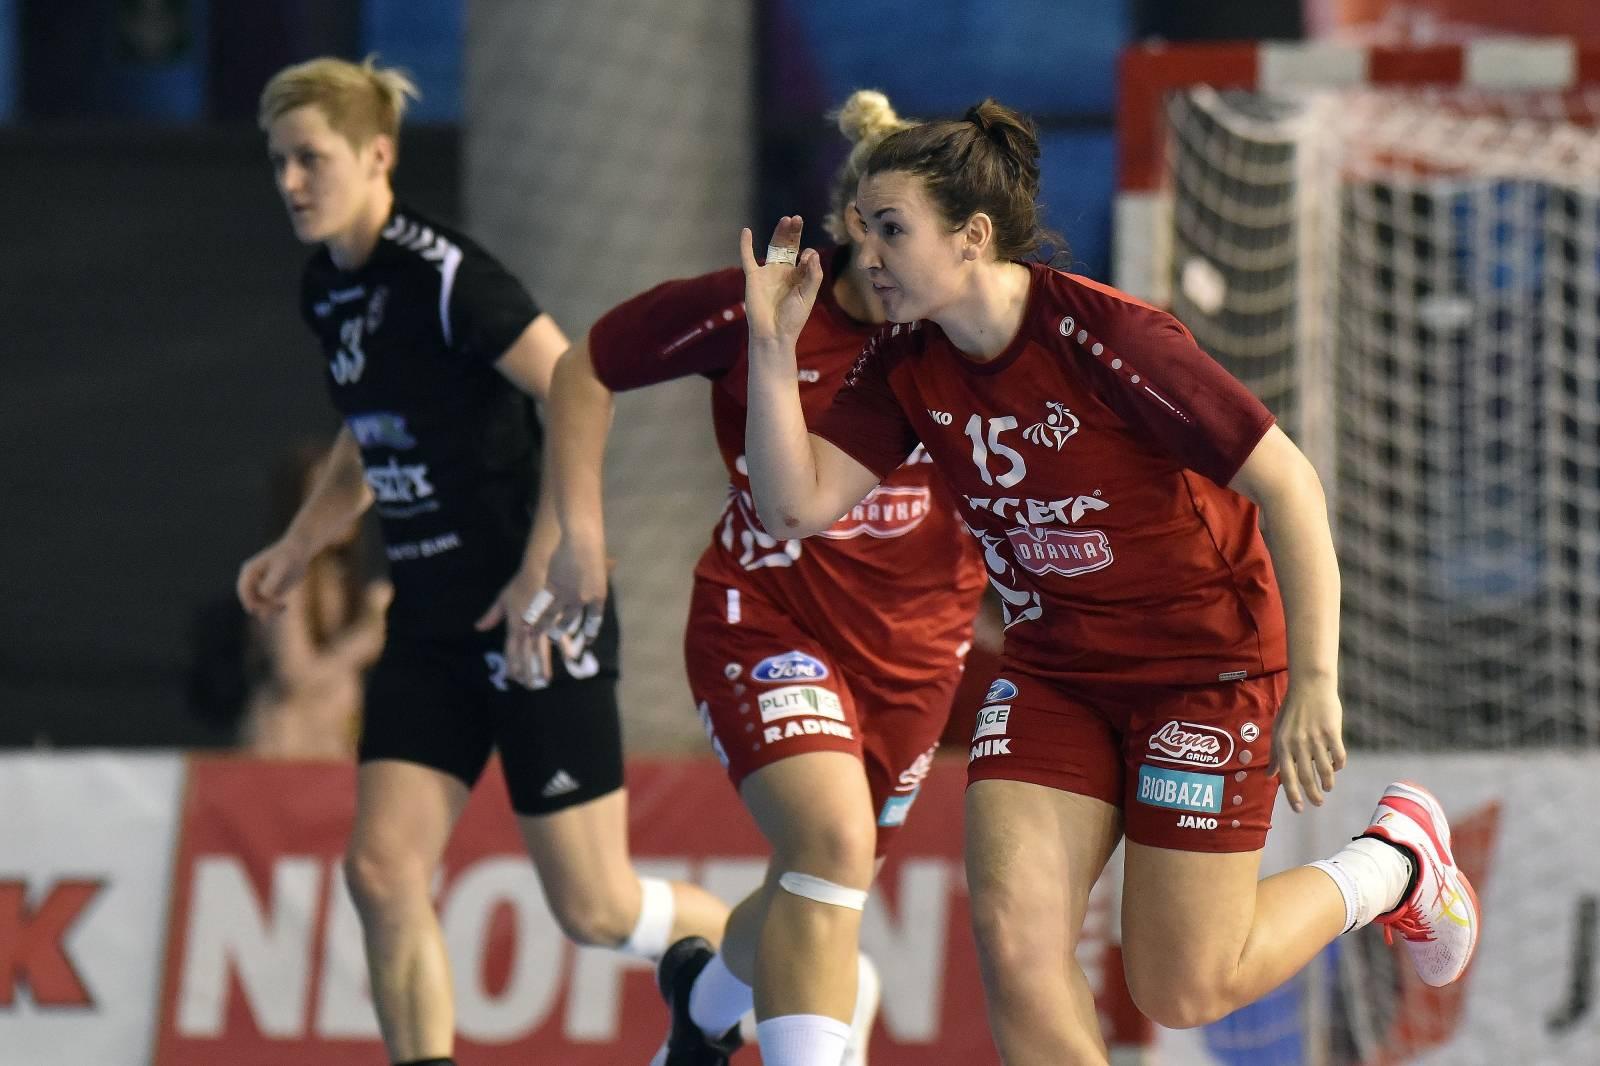 Koprivnica: Utakmica 4. kola EHF kupa, HC Podravka Vegeta - Siofok KC